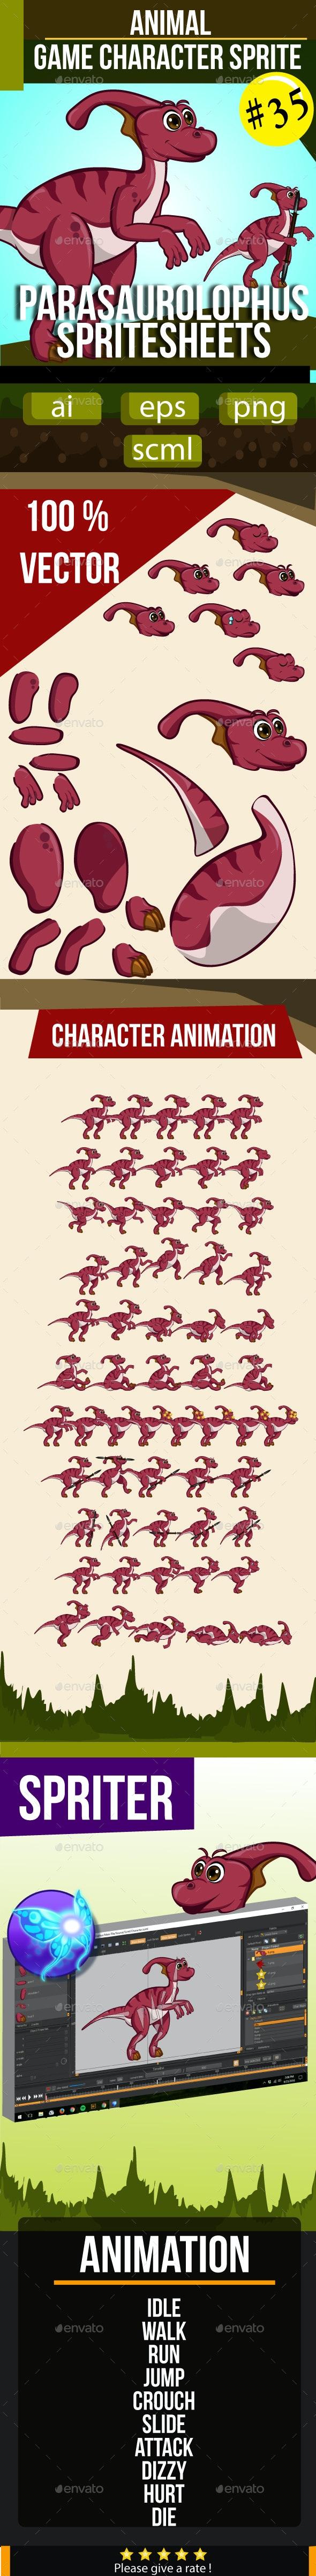 Parasaurolophus Dinosaurus Sprite Character - Sprites Game Assets